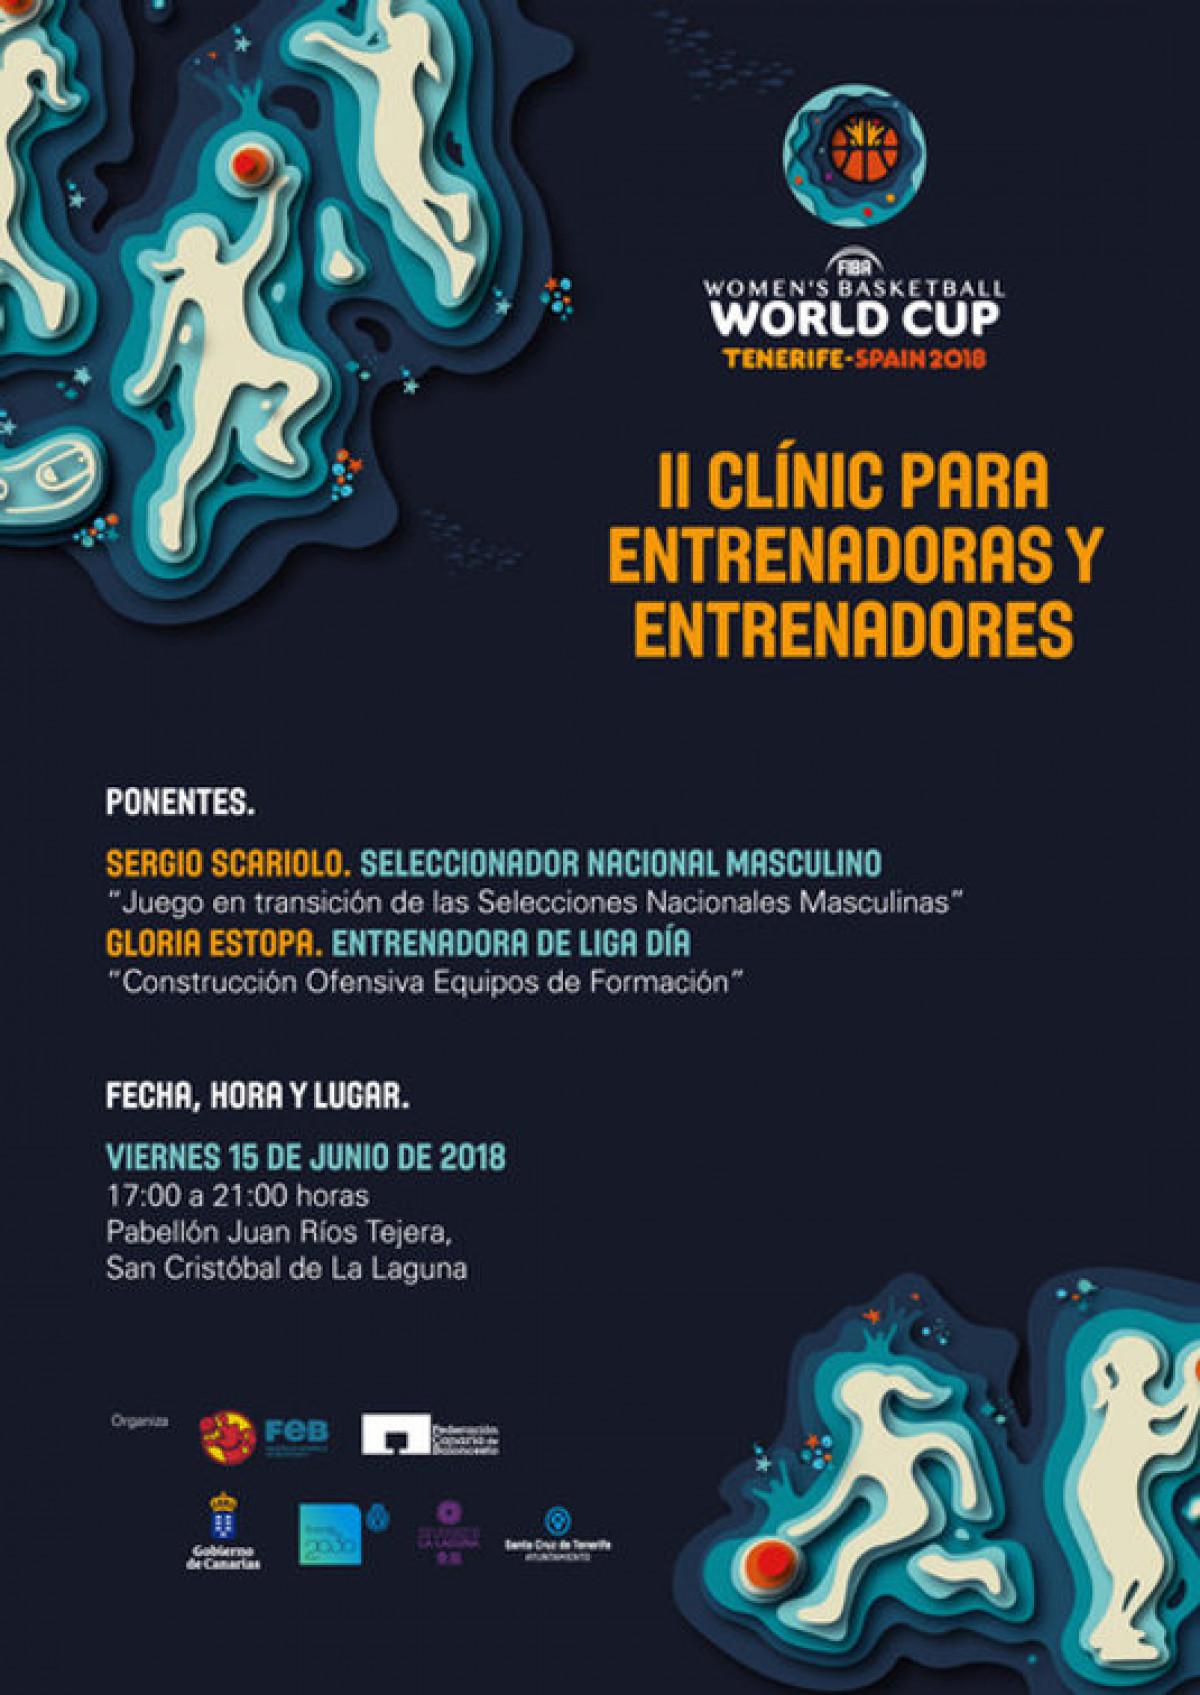 II cartel clinic OAD LA LAGUNA 2018